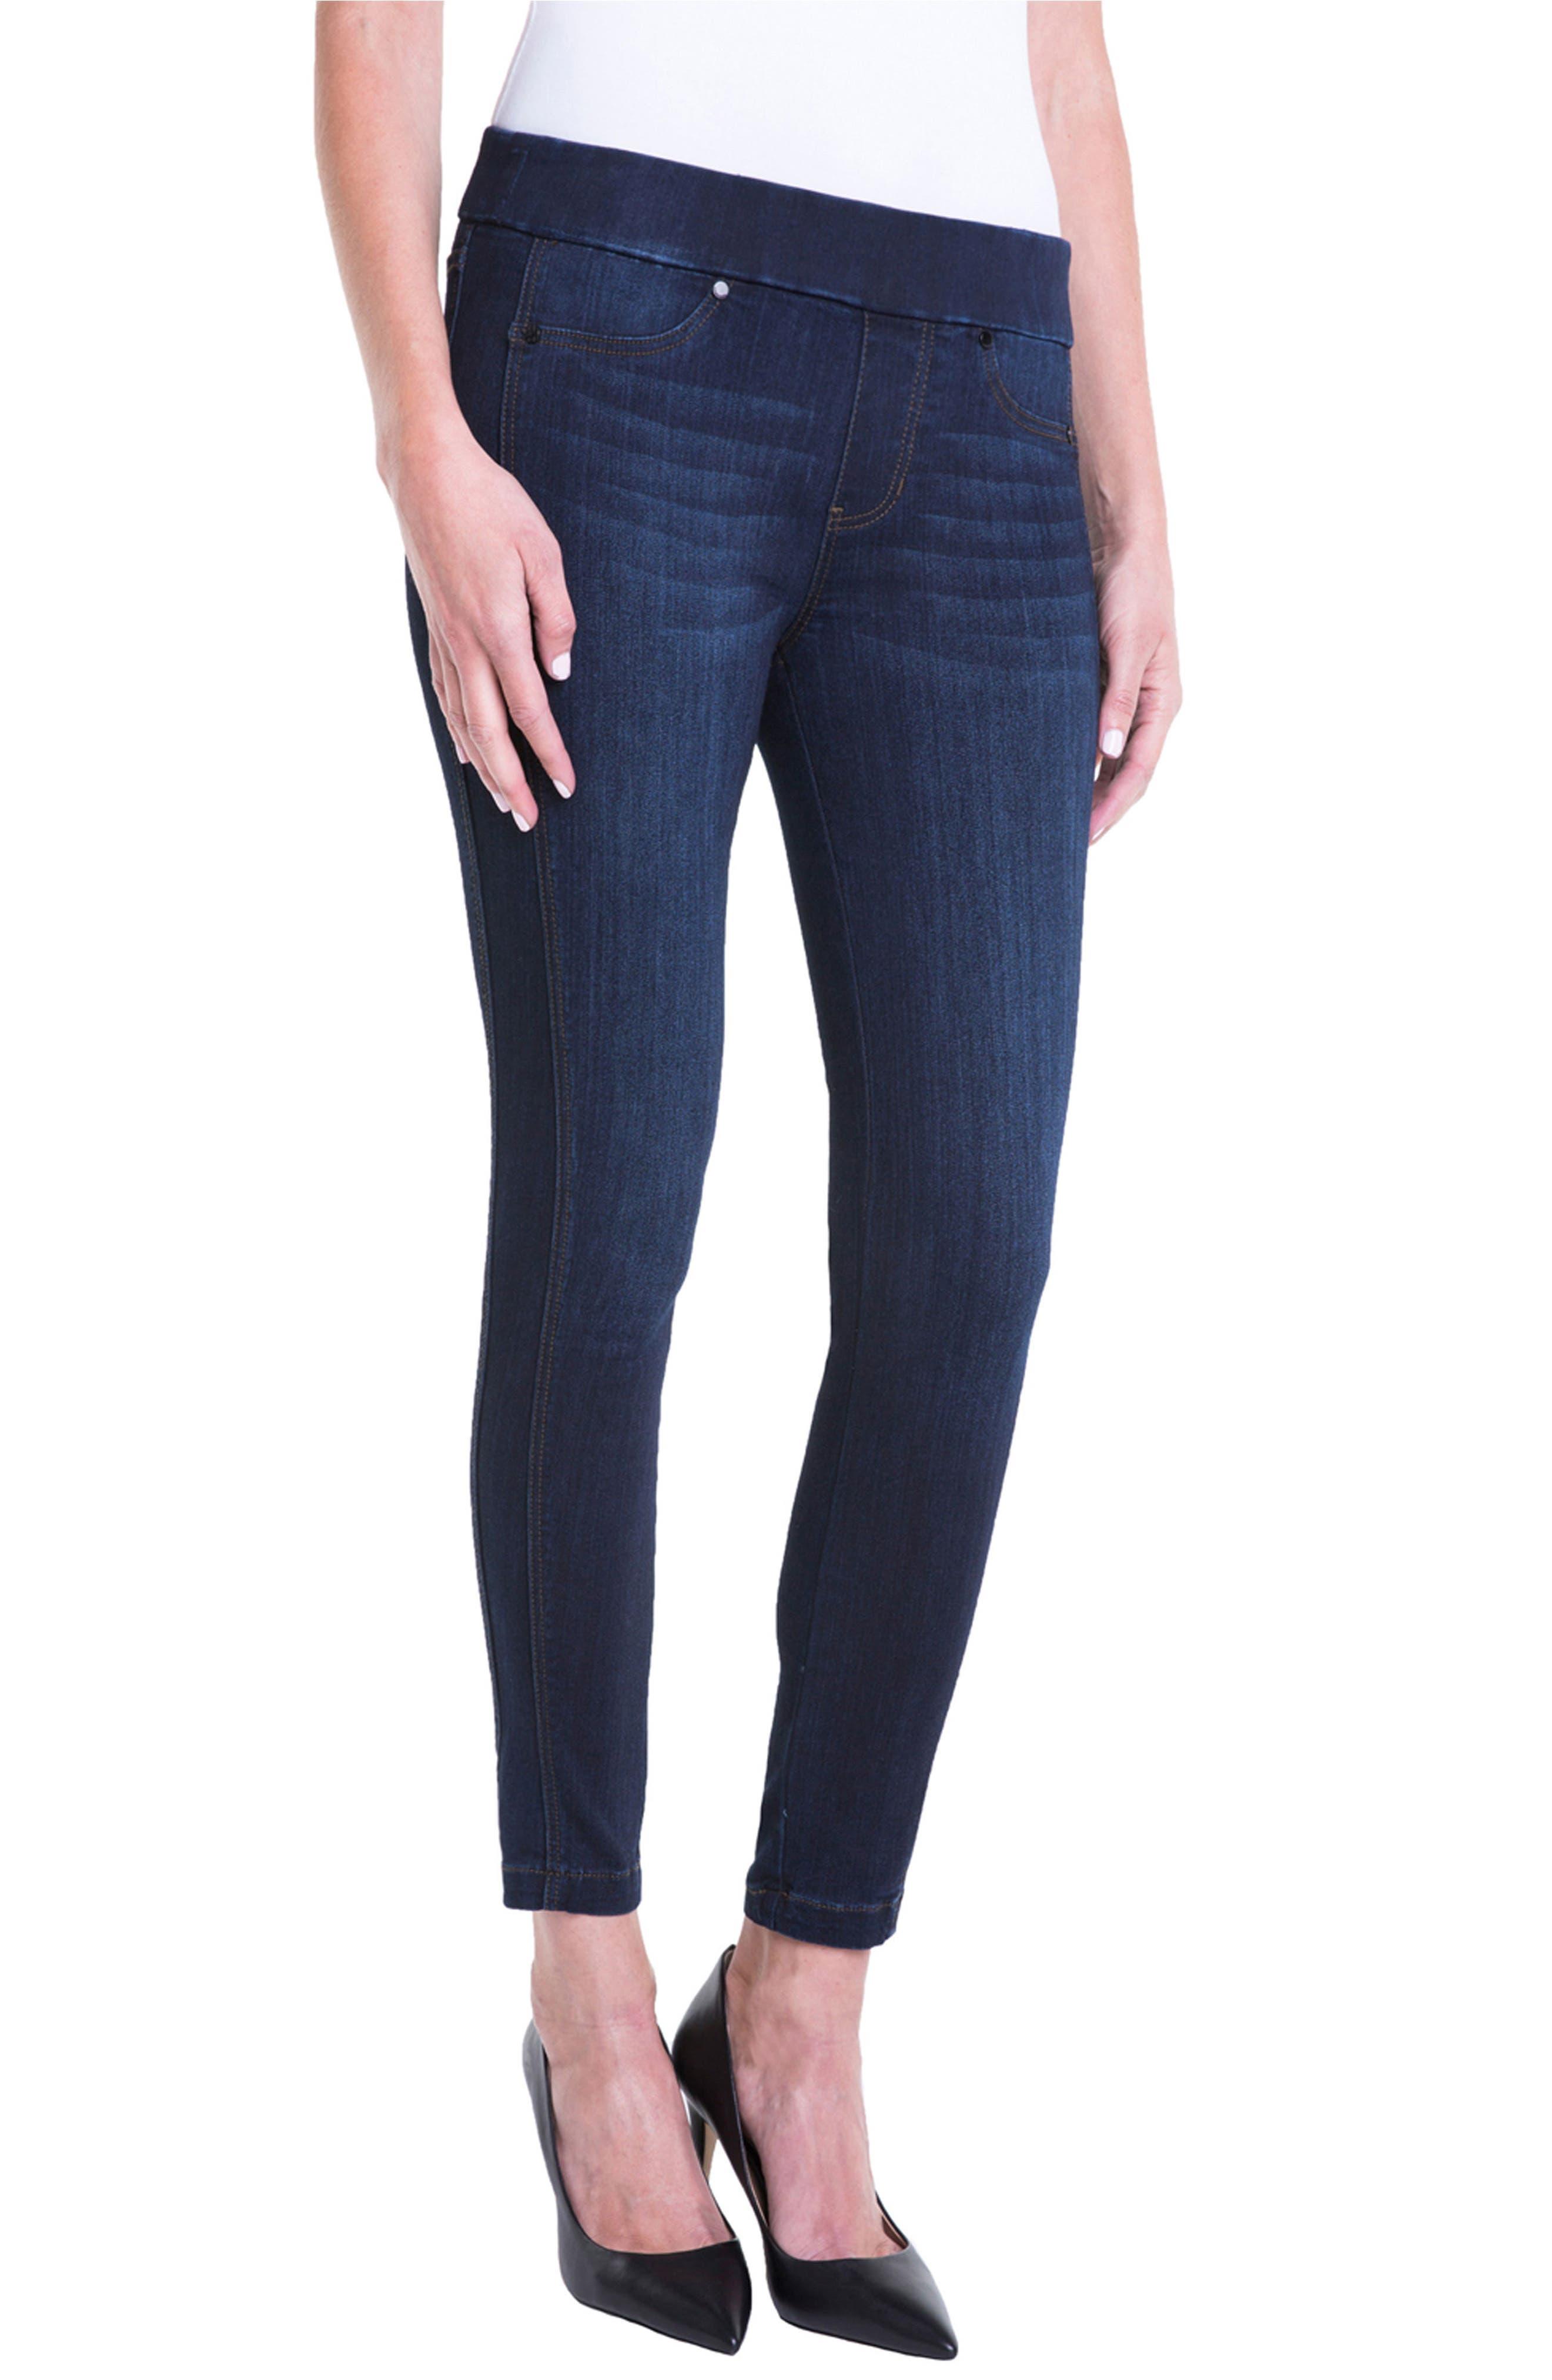 Liverpool Jeans Company Sophia Ankle Denim Leggings (Regular & Petite)